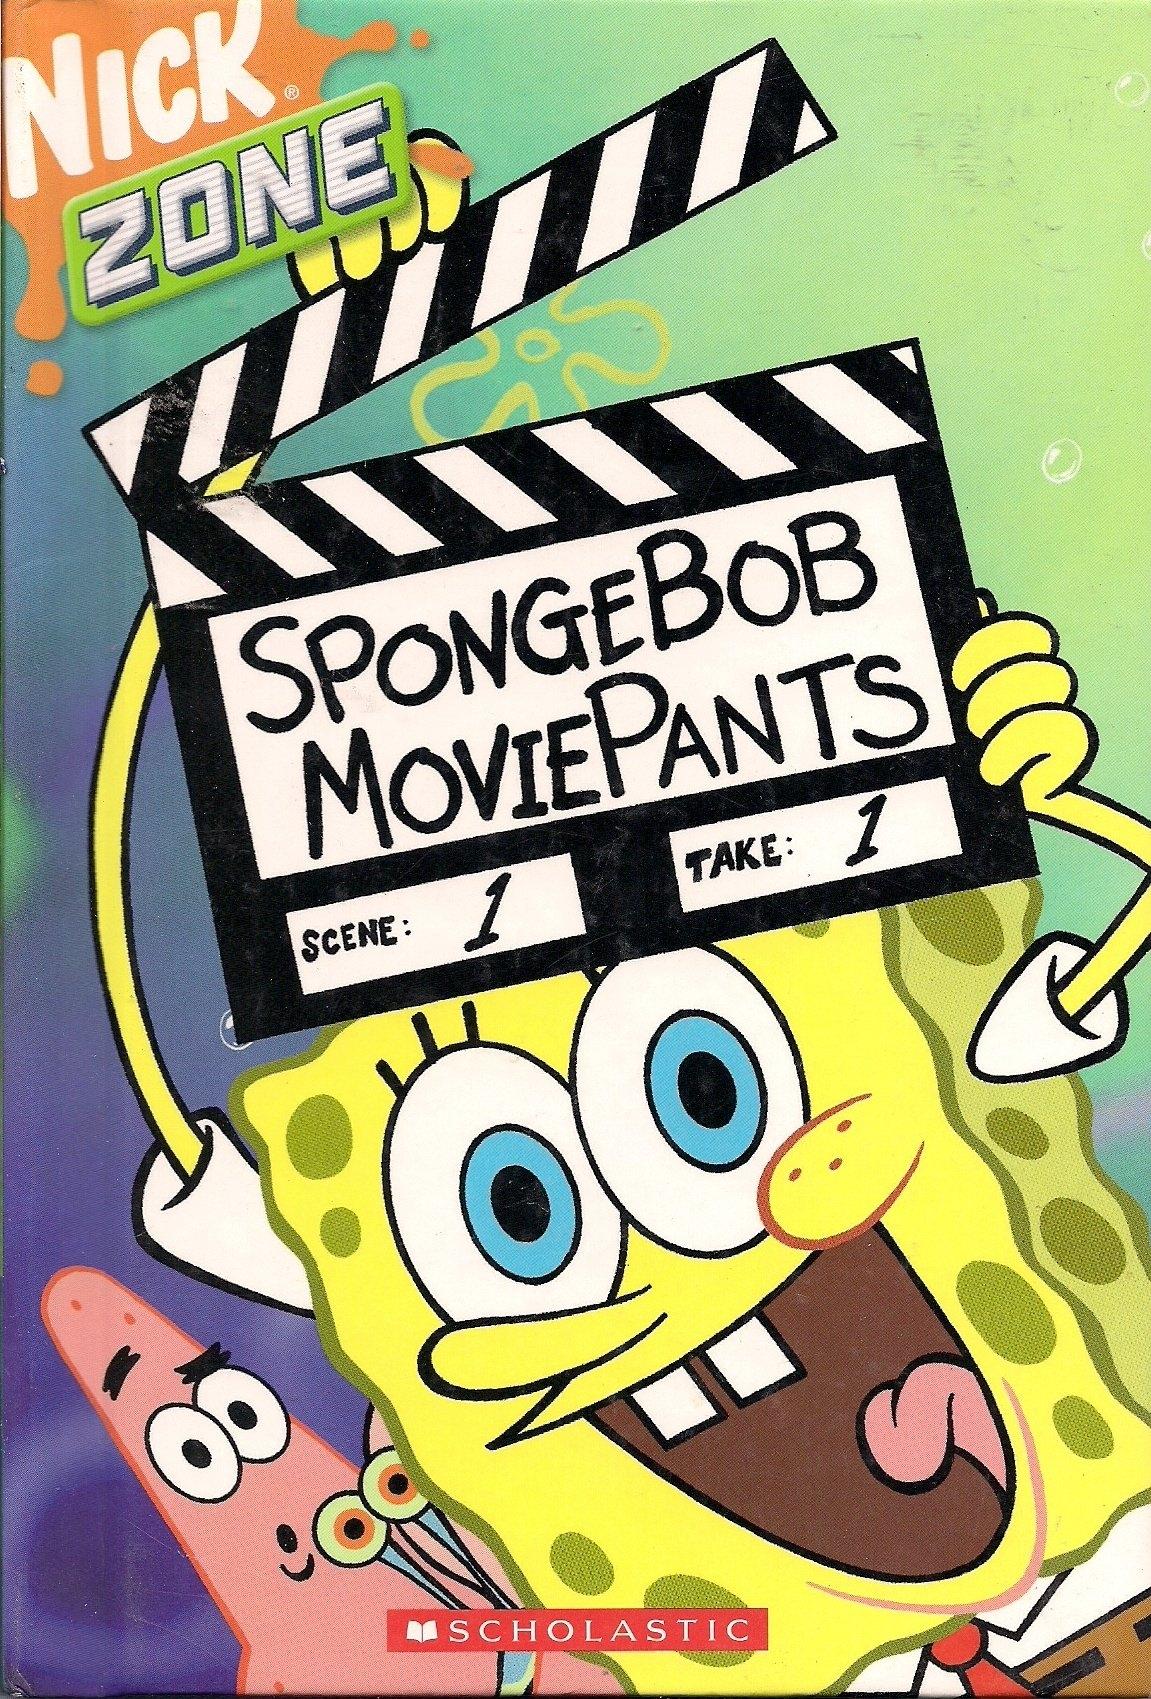 Spongebob Moviepants